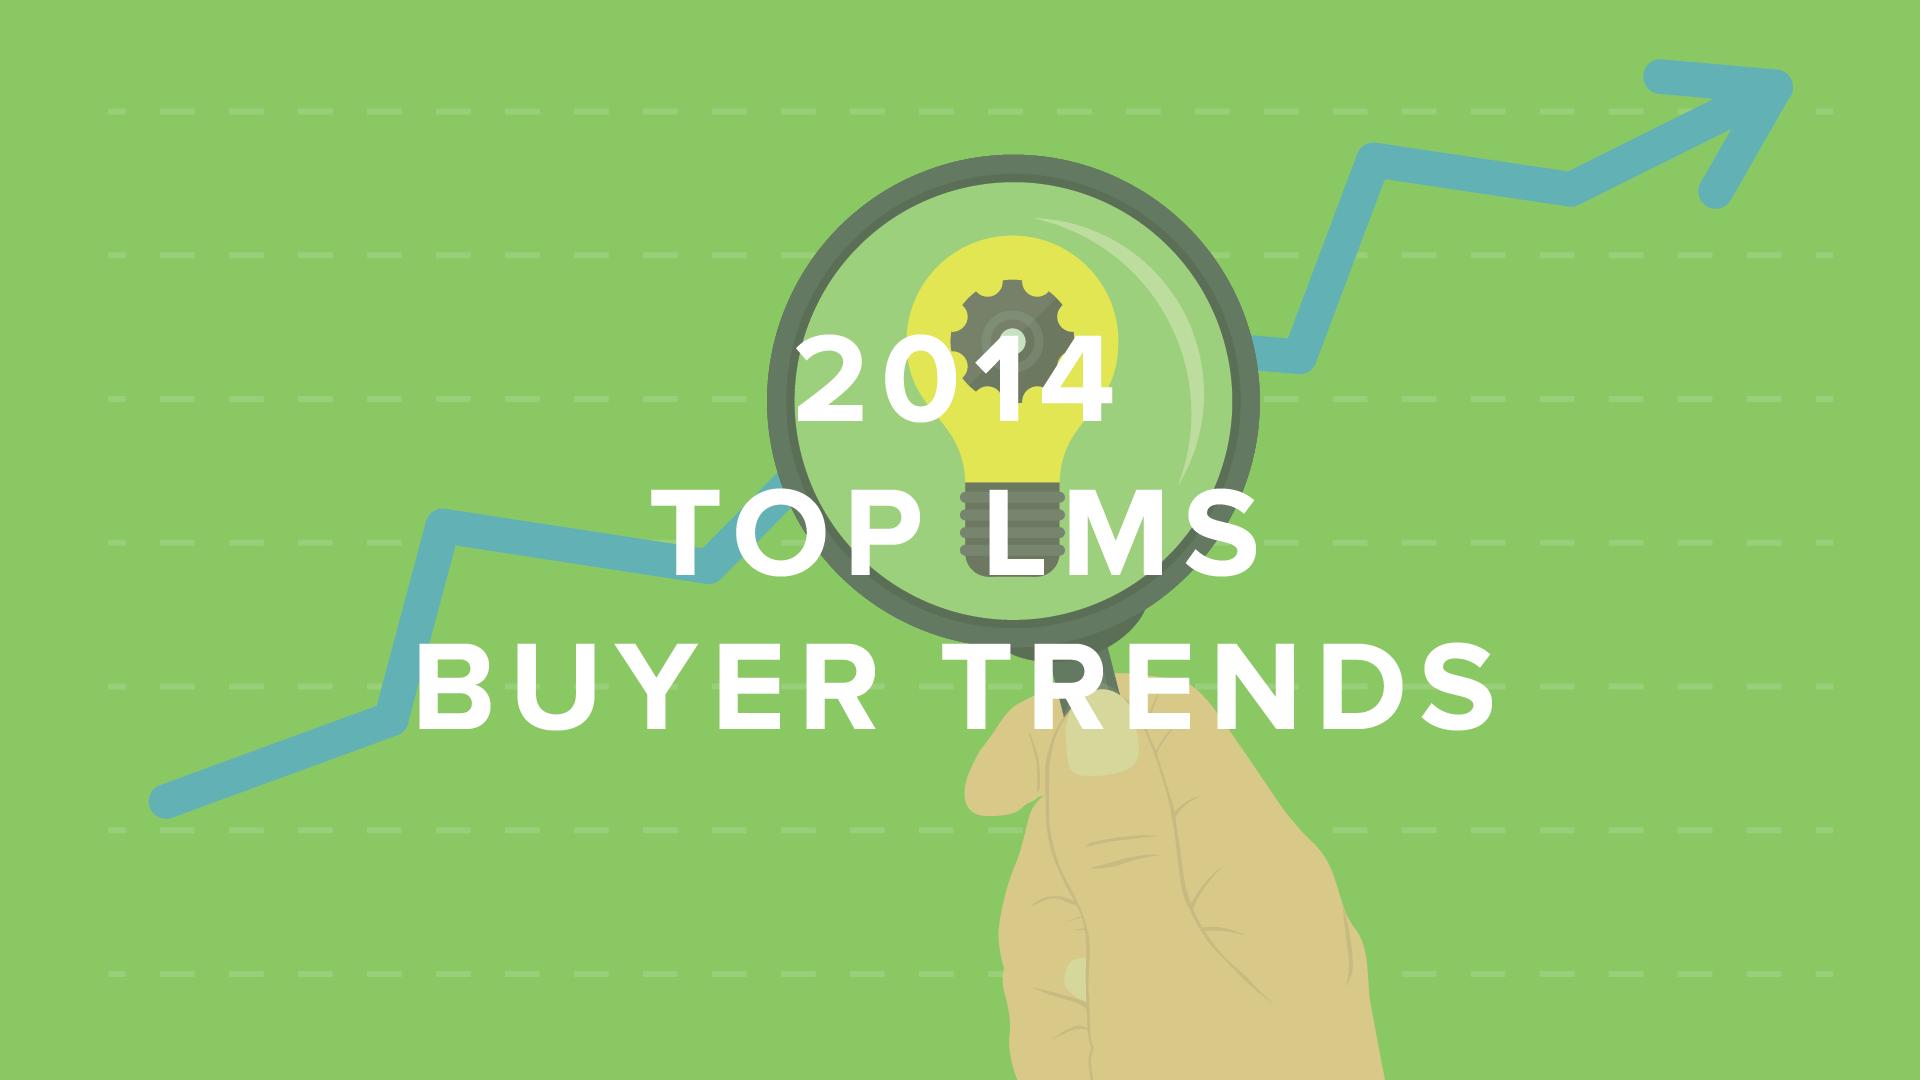 Top LMS Buyer Trends in 2014 - DigitalChalk Blog thumbnail